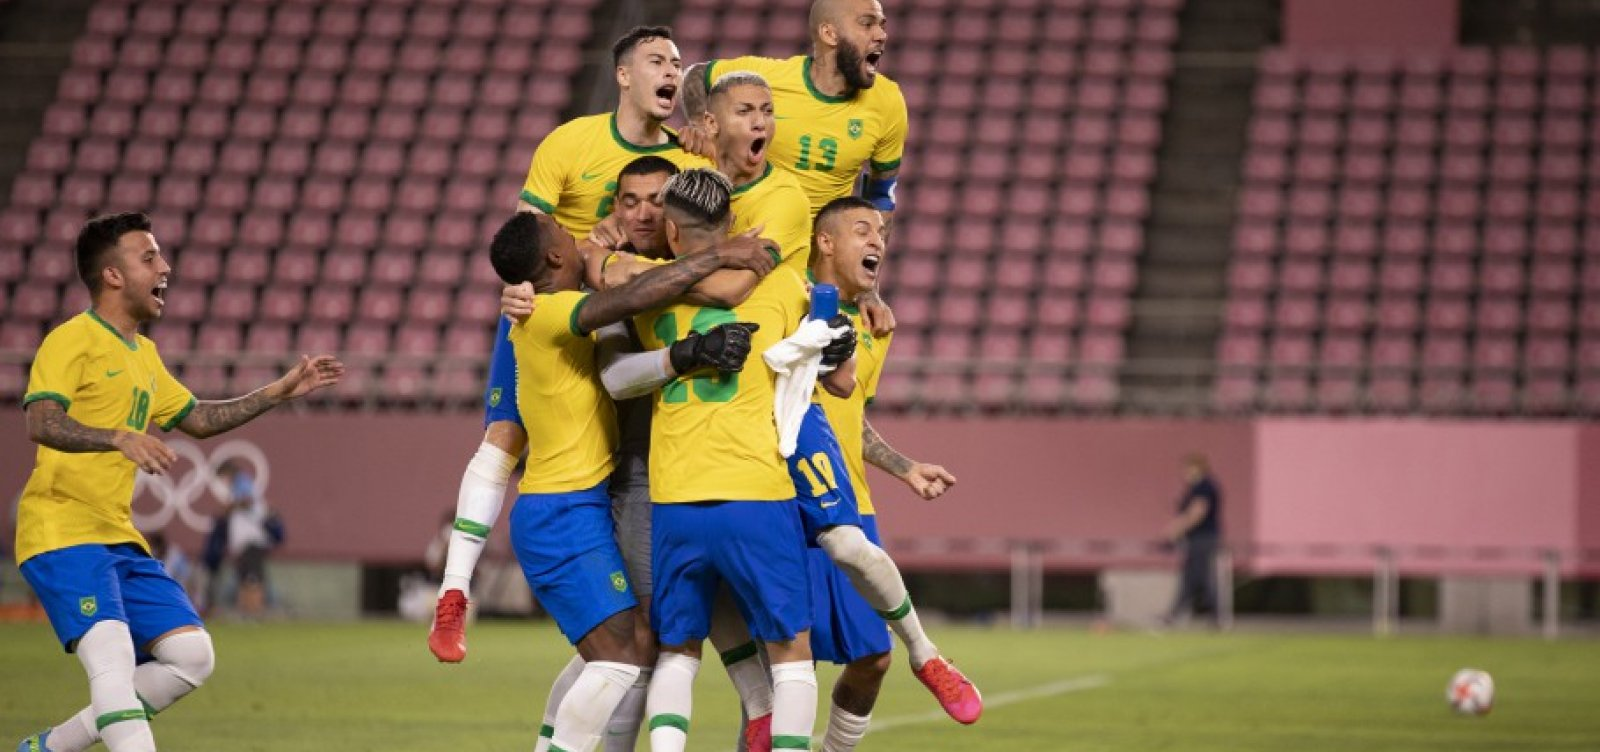 Nos pênaltis, Brasil bate México e vai para terceira final olímpica consecutiva